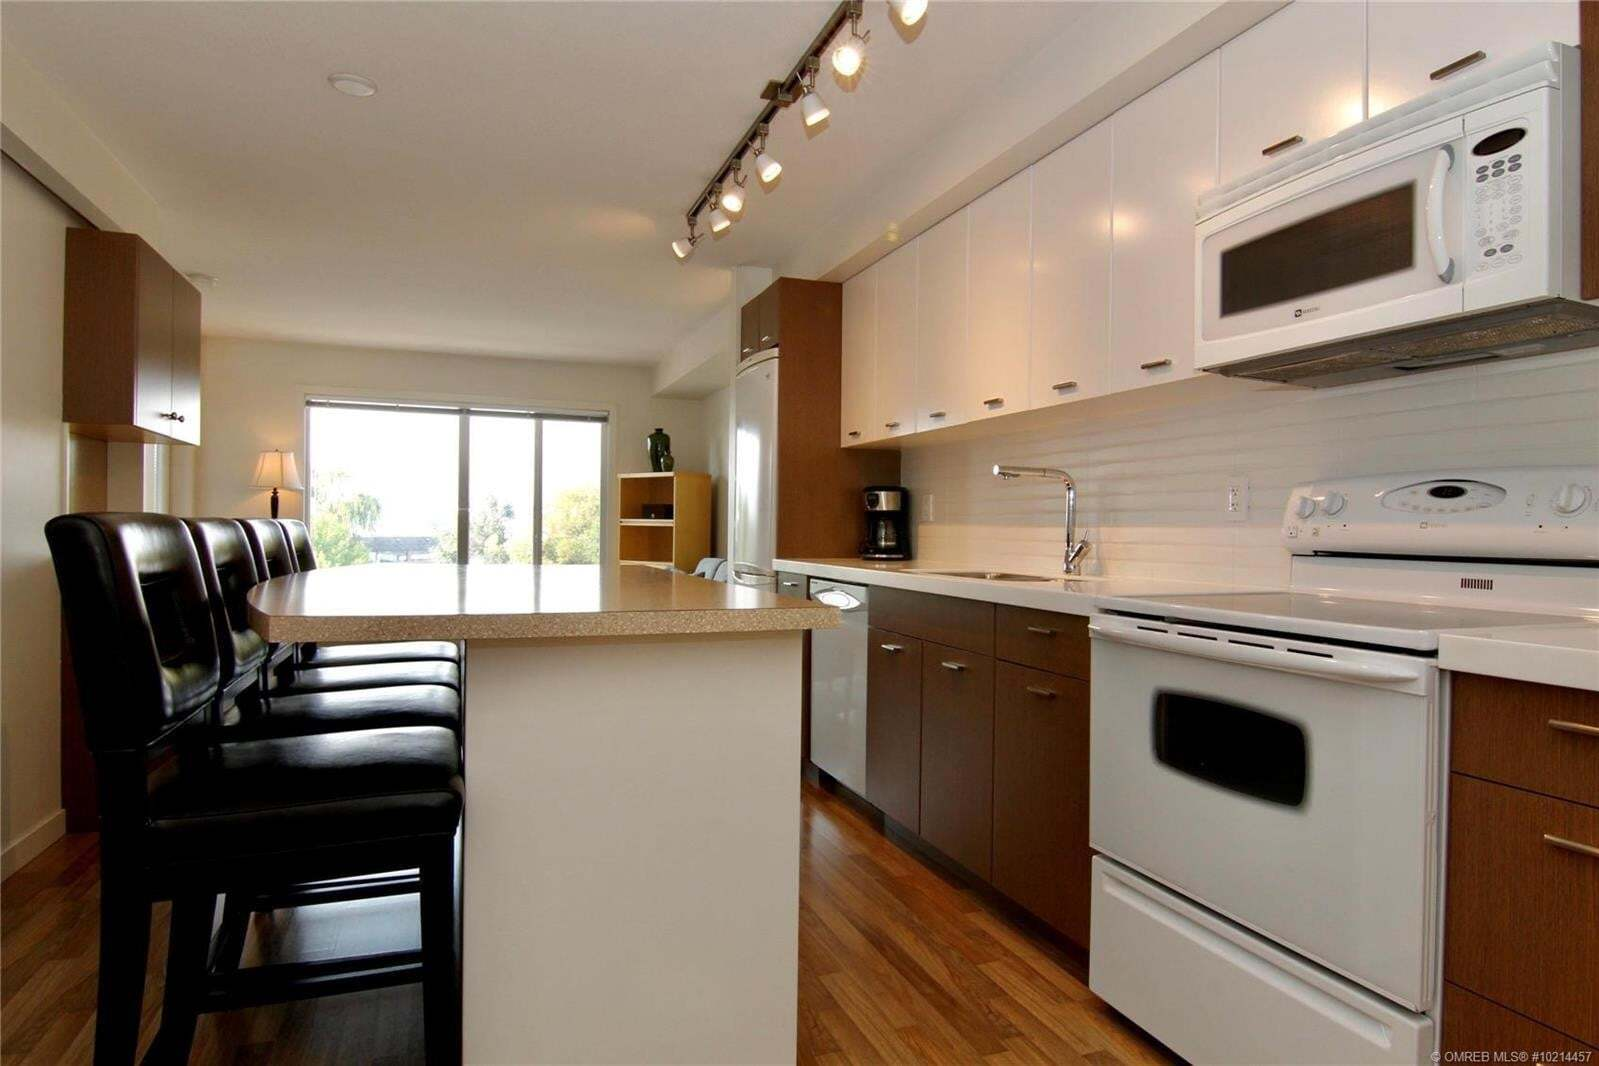 Condo for sale at 1550 Dickson Ave Kelowna British Columbia - MLS: 10214457